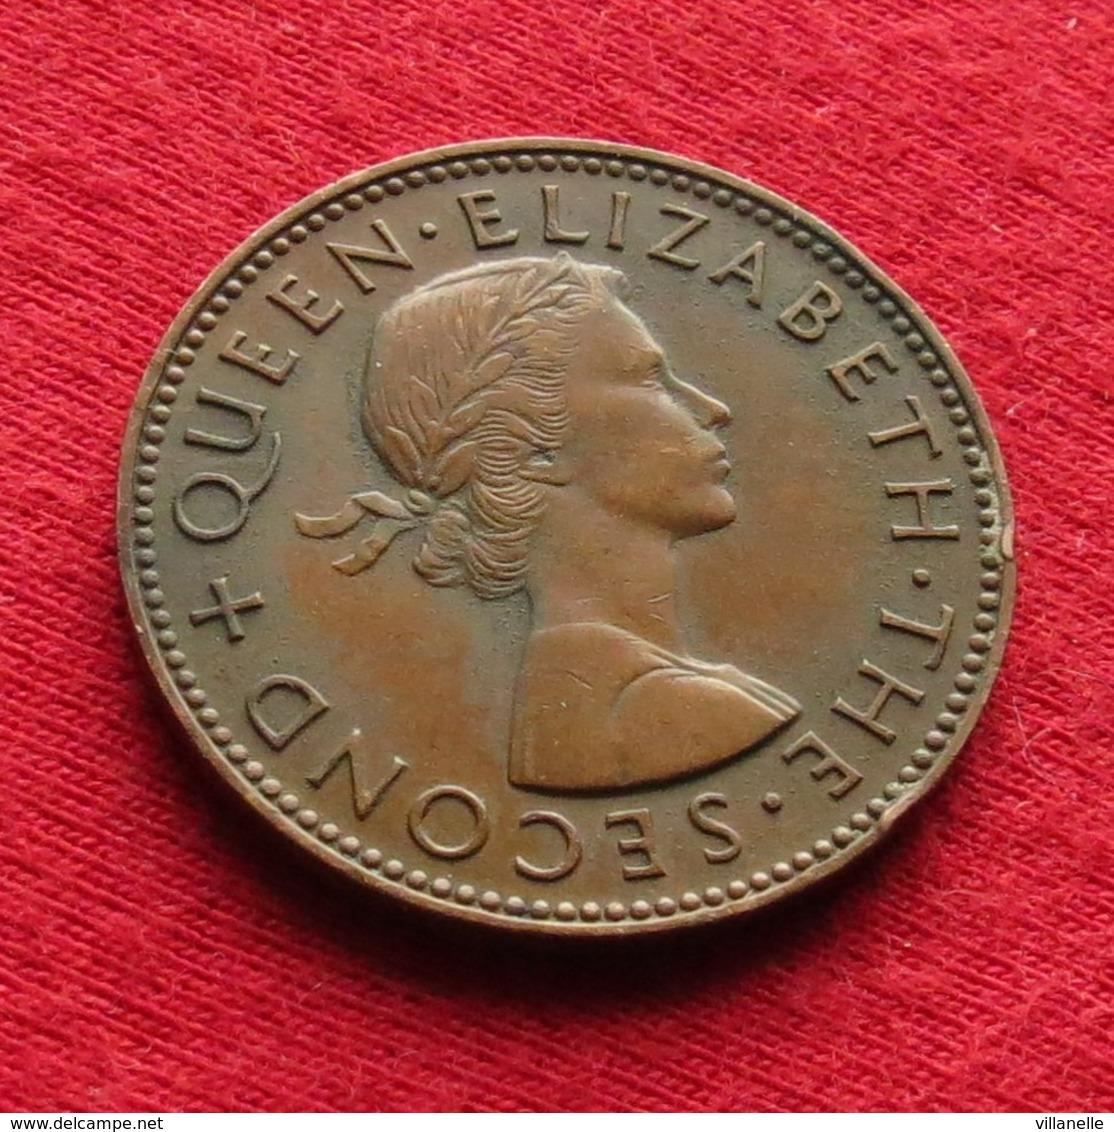 New Zealand 1/2 Half Penny 1958  Nova Zelandia Nuova Zelanda Nouvelle Zelande #2 Wº - Nuova Zelanda